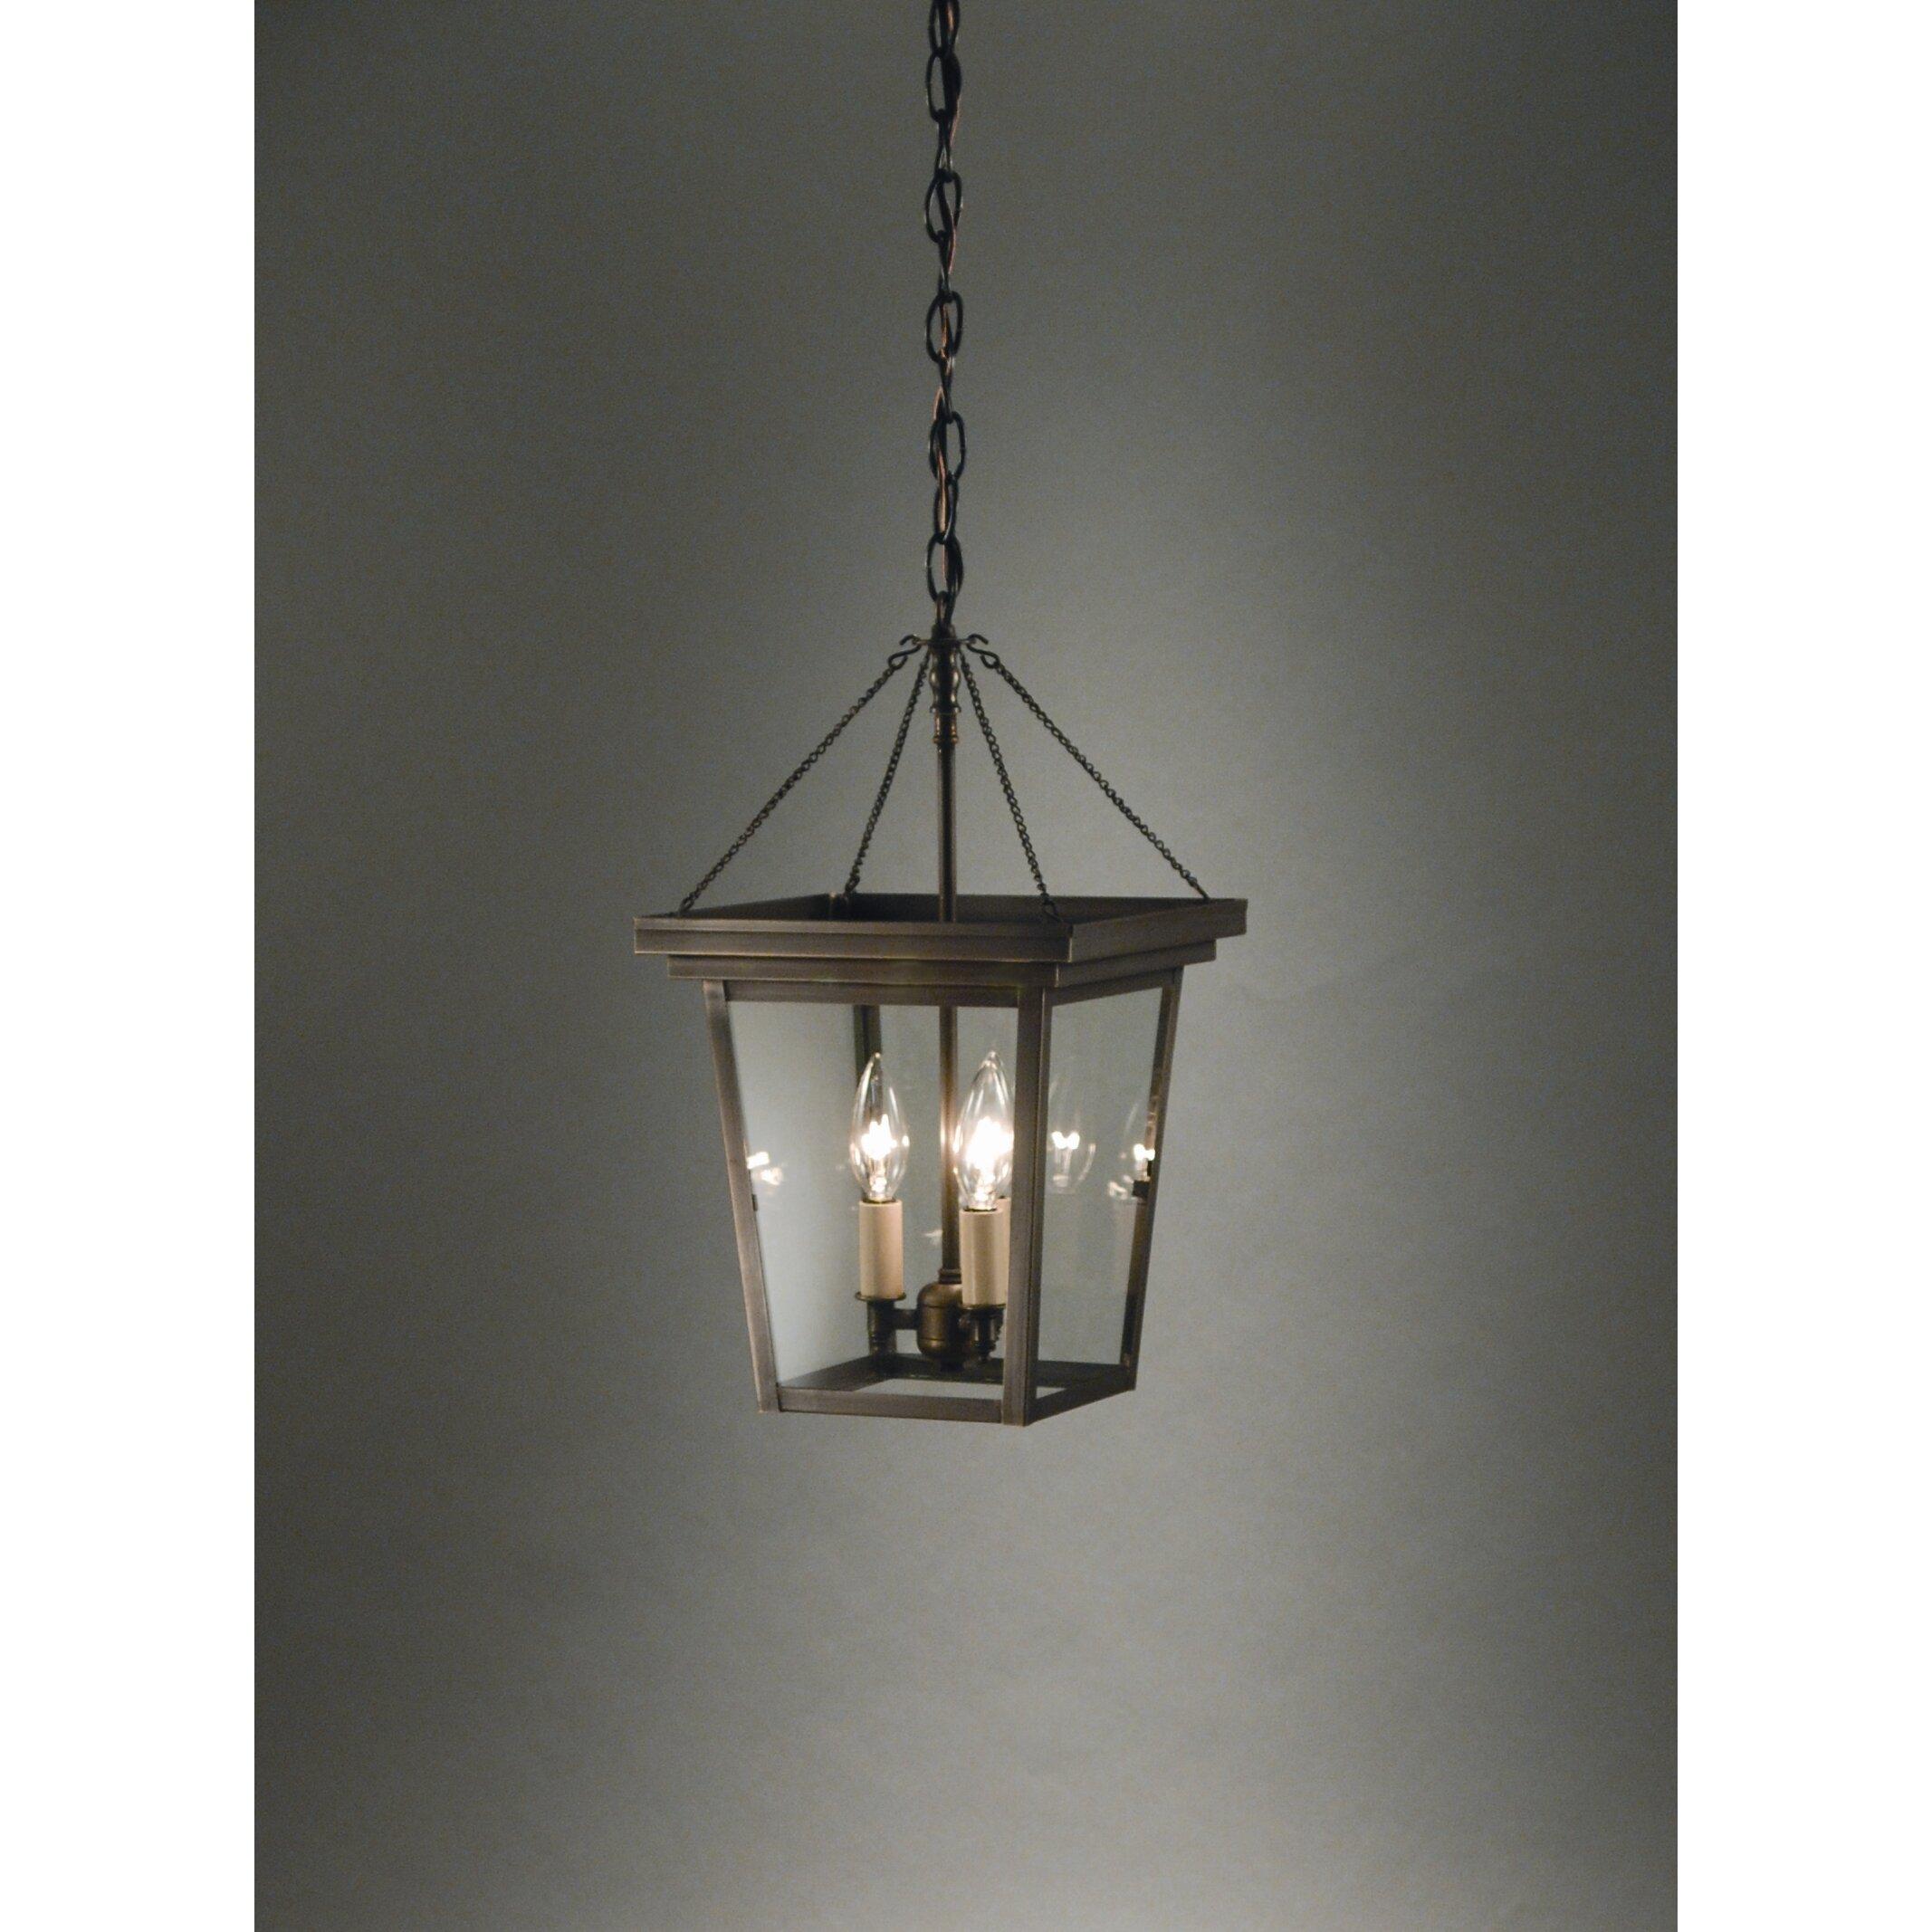 Wayfair Outdoor Hanging Lights: Williams 3 Light Outdoor Hanging Lantern